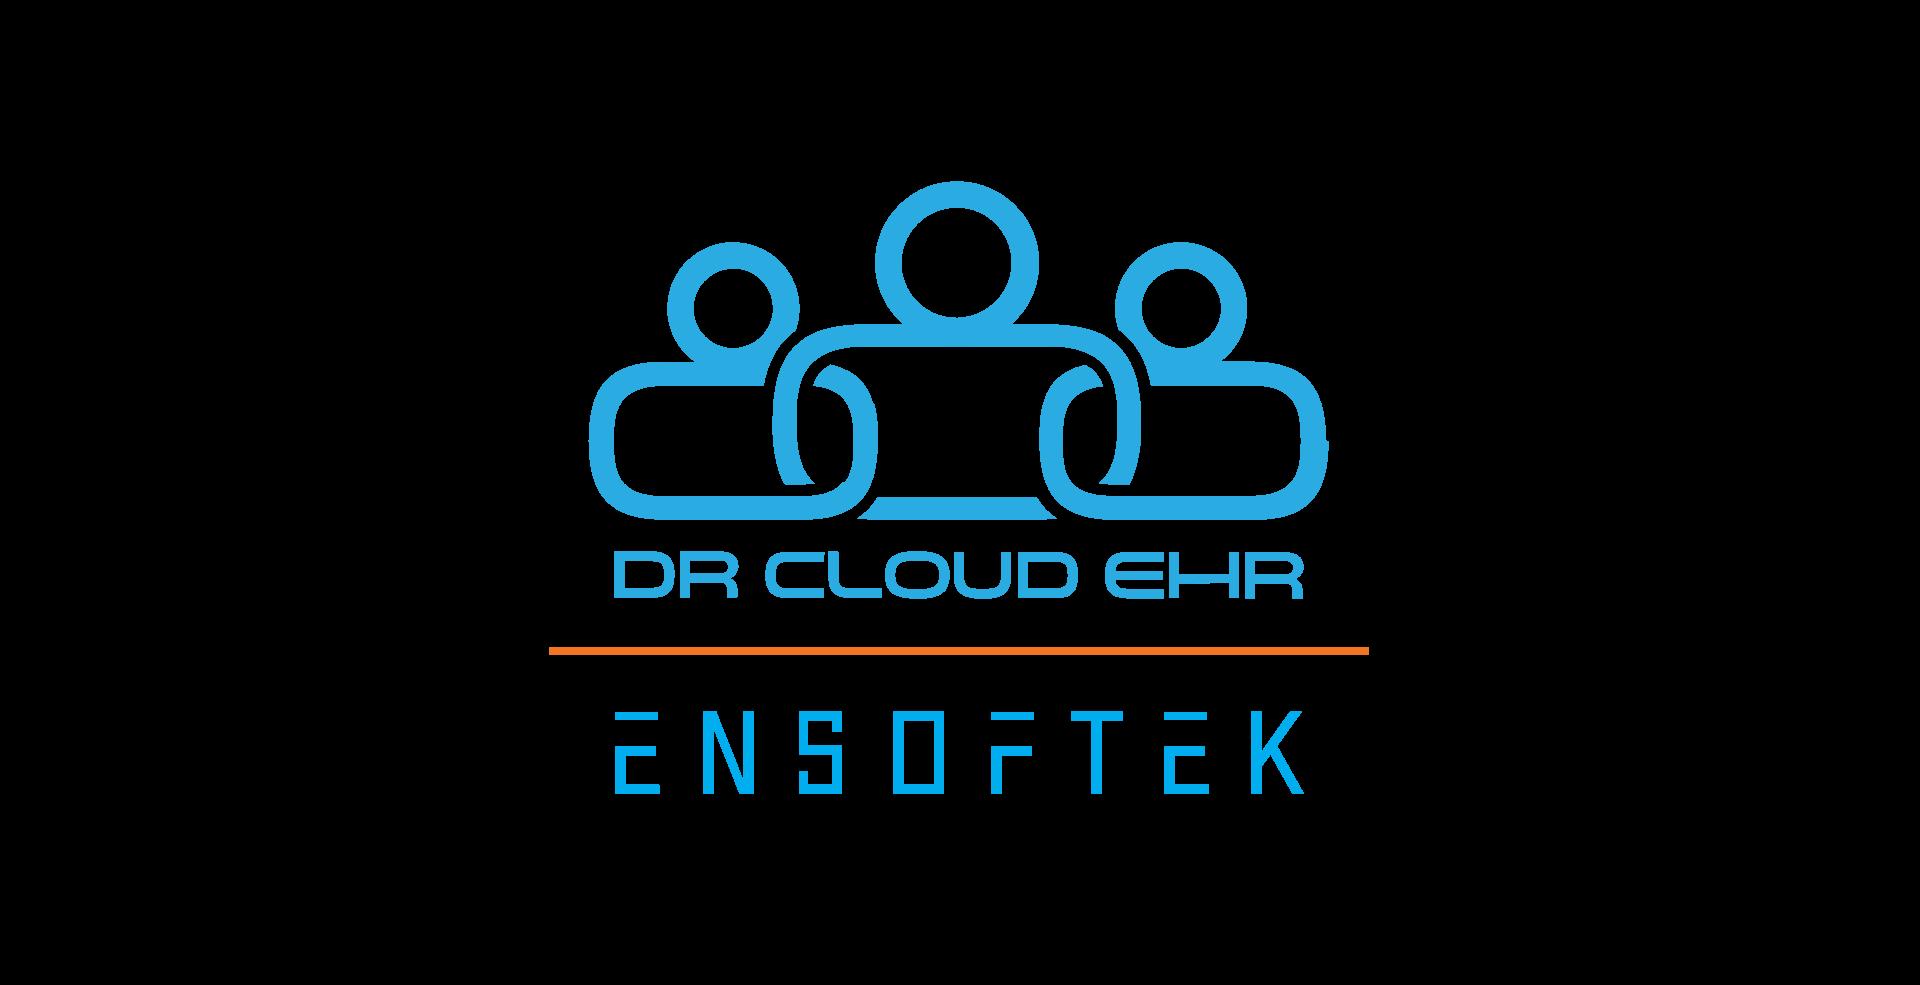 ensoftek-logo-tr.png